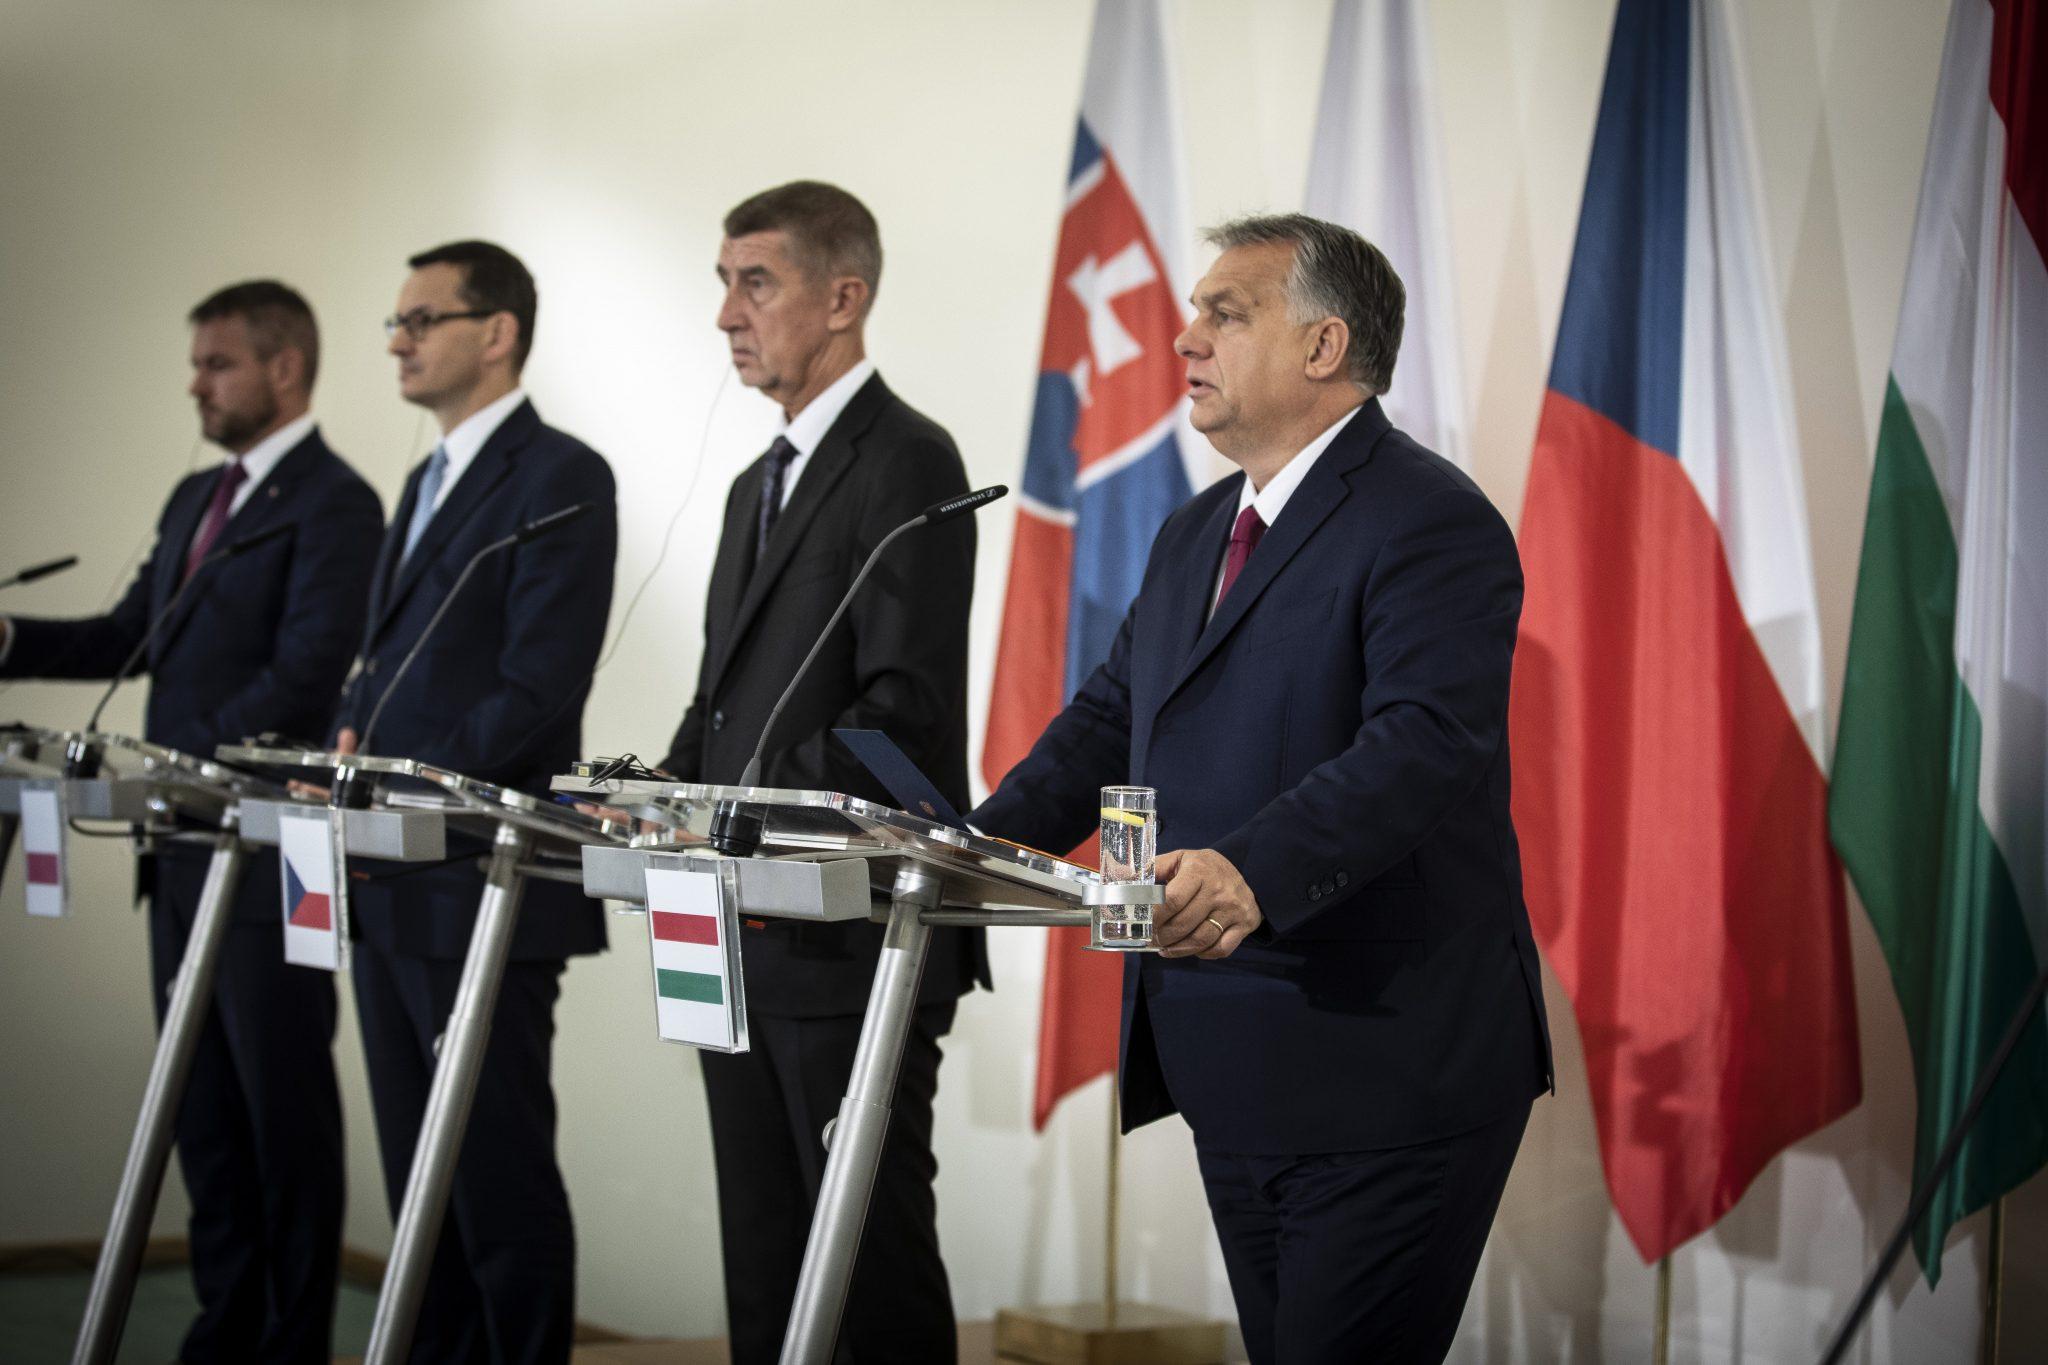 Orbán Calls for Fair EU Budget post's picture